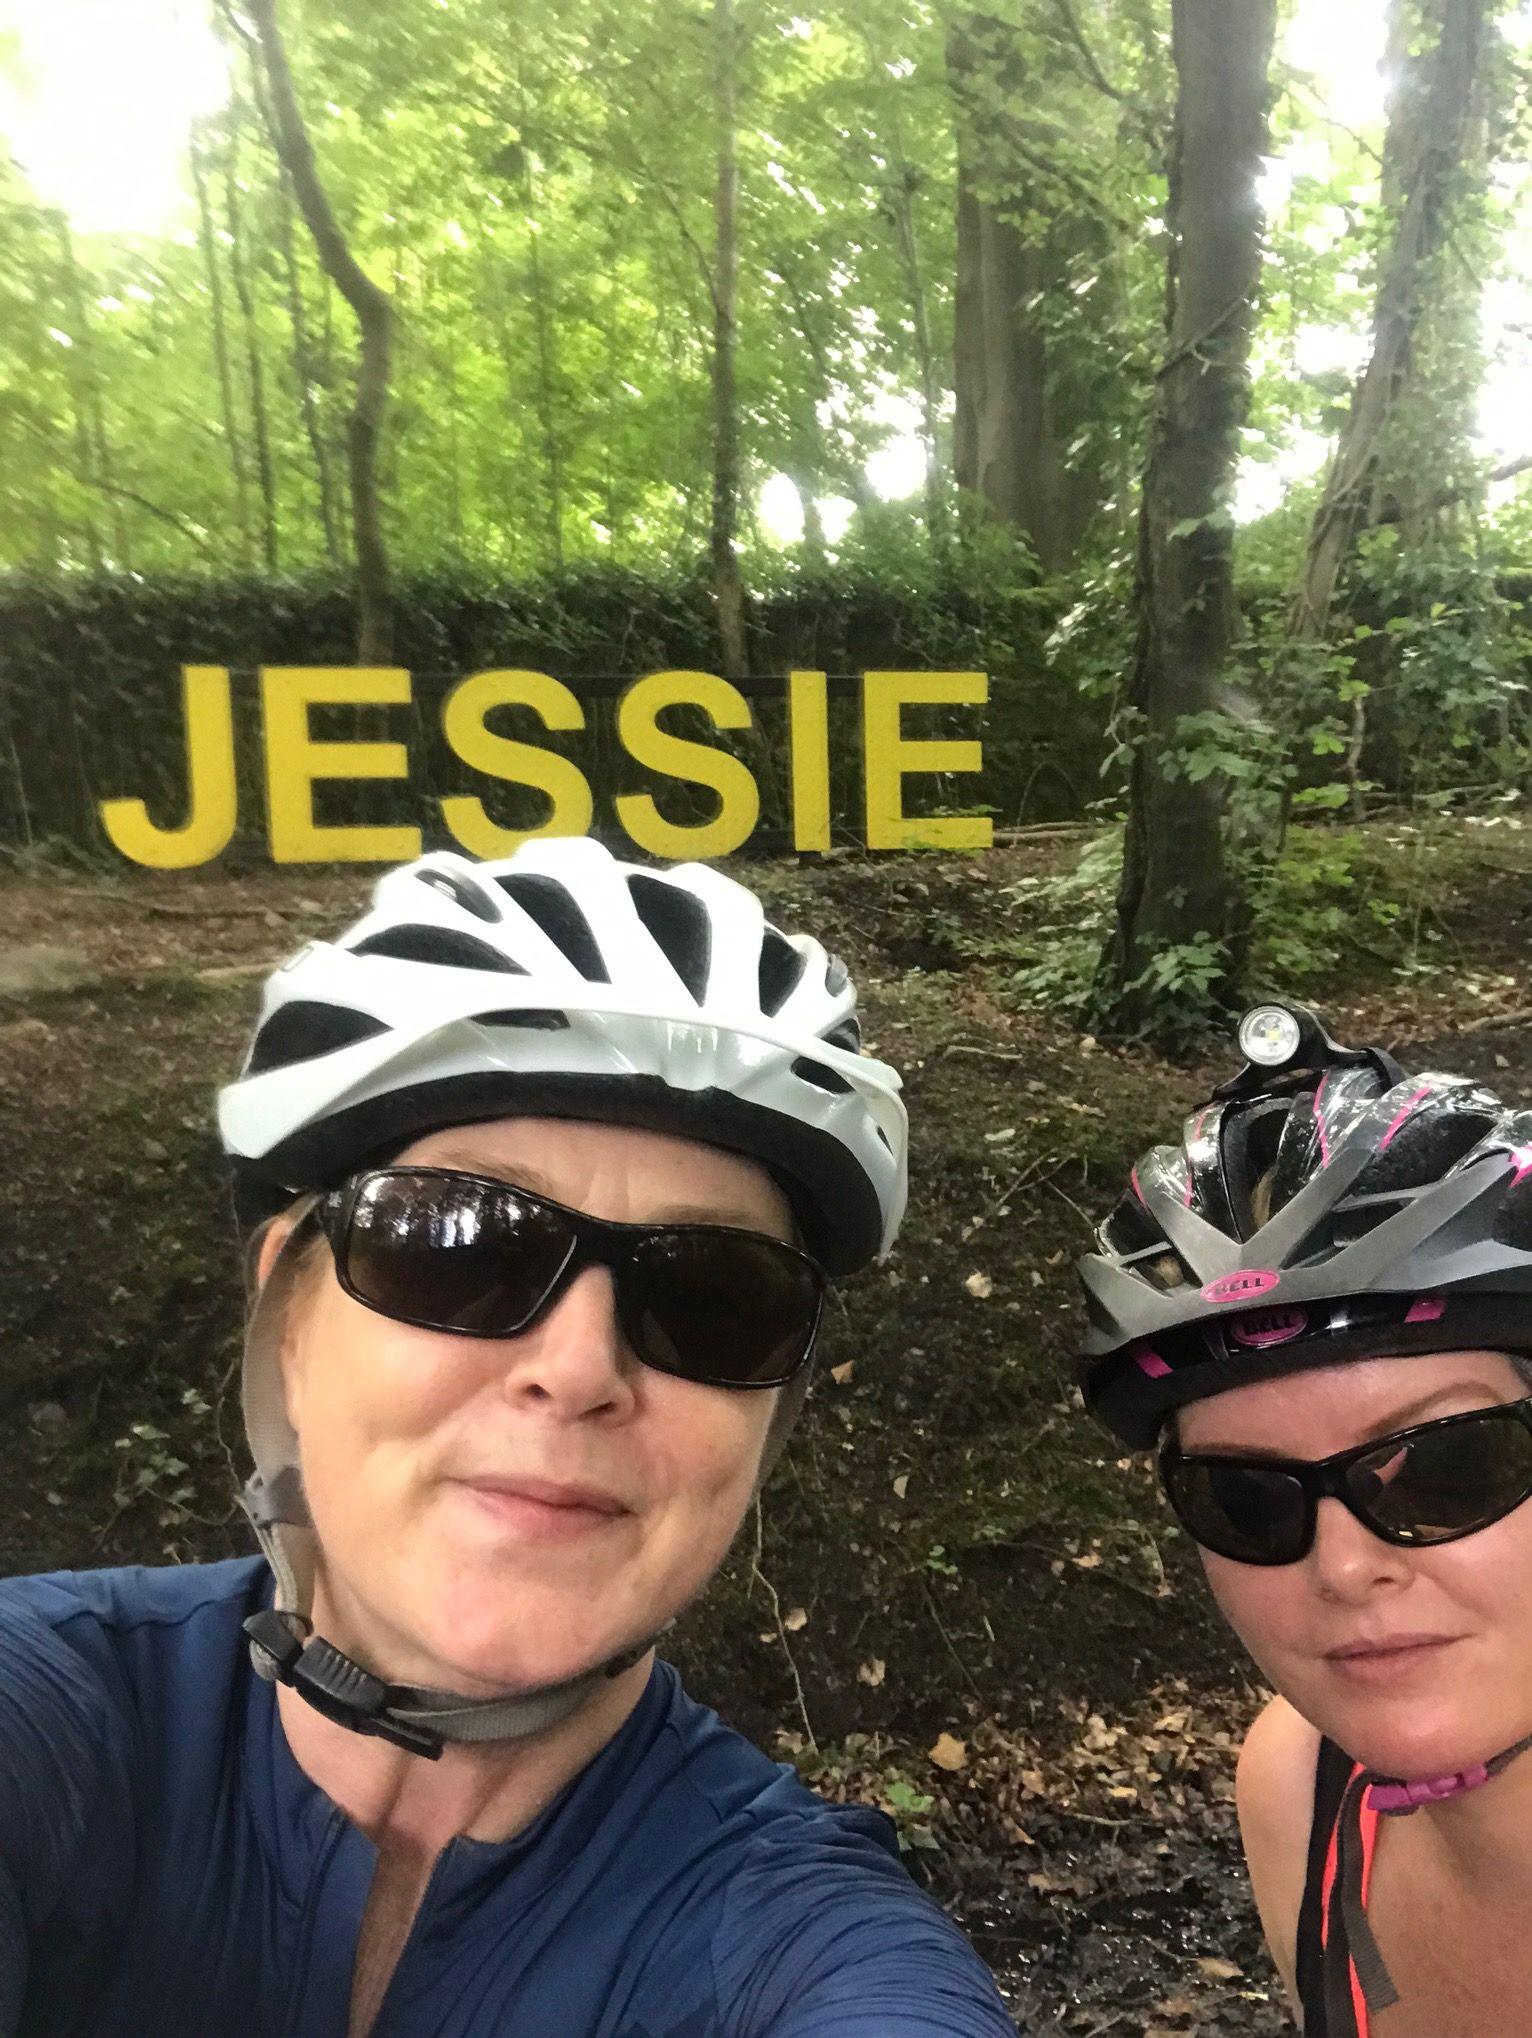 Pin By Alison Howie On Cycling Bicycle Helmet Helmet Bicycle